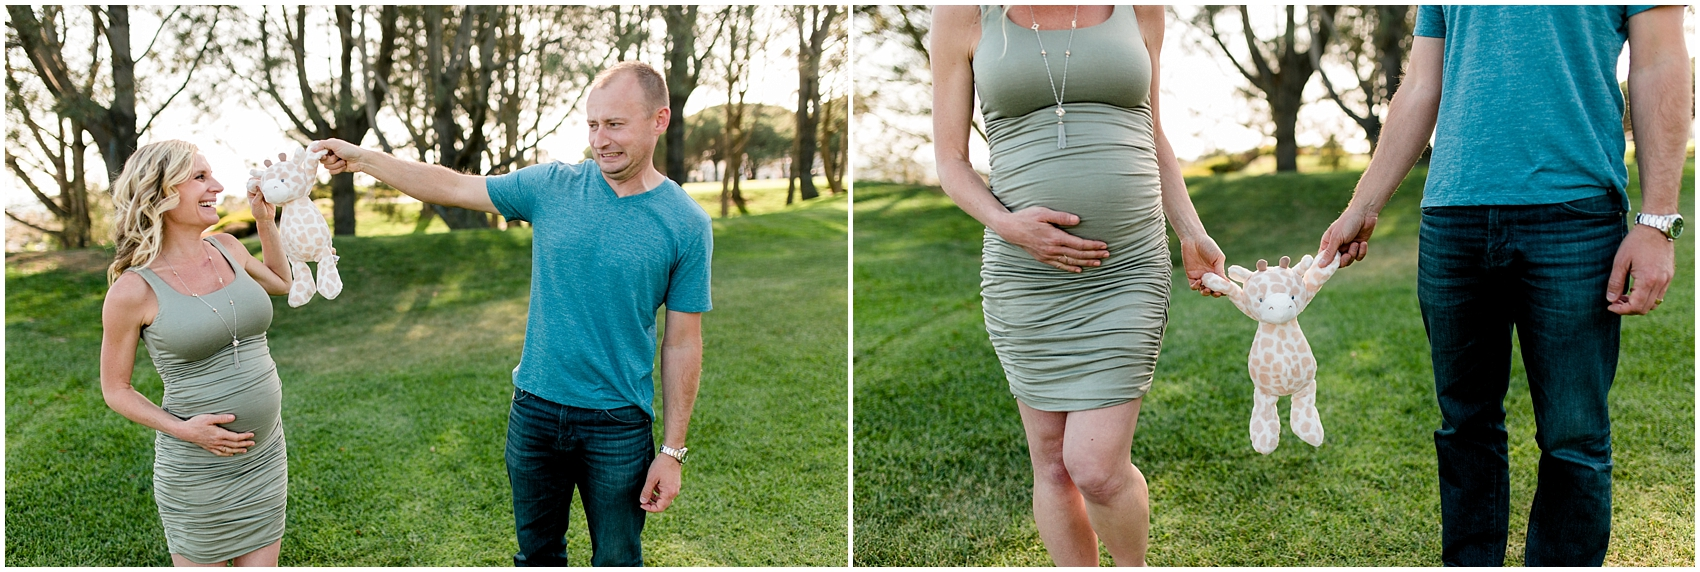 Toni and Paul's Maternity Session-0015.jpg